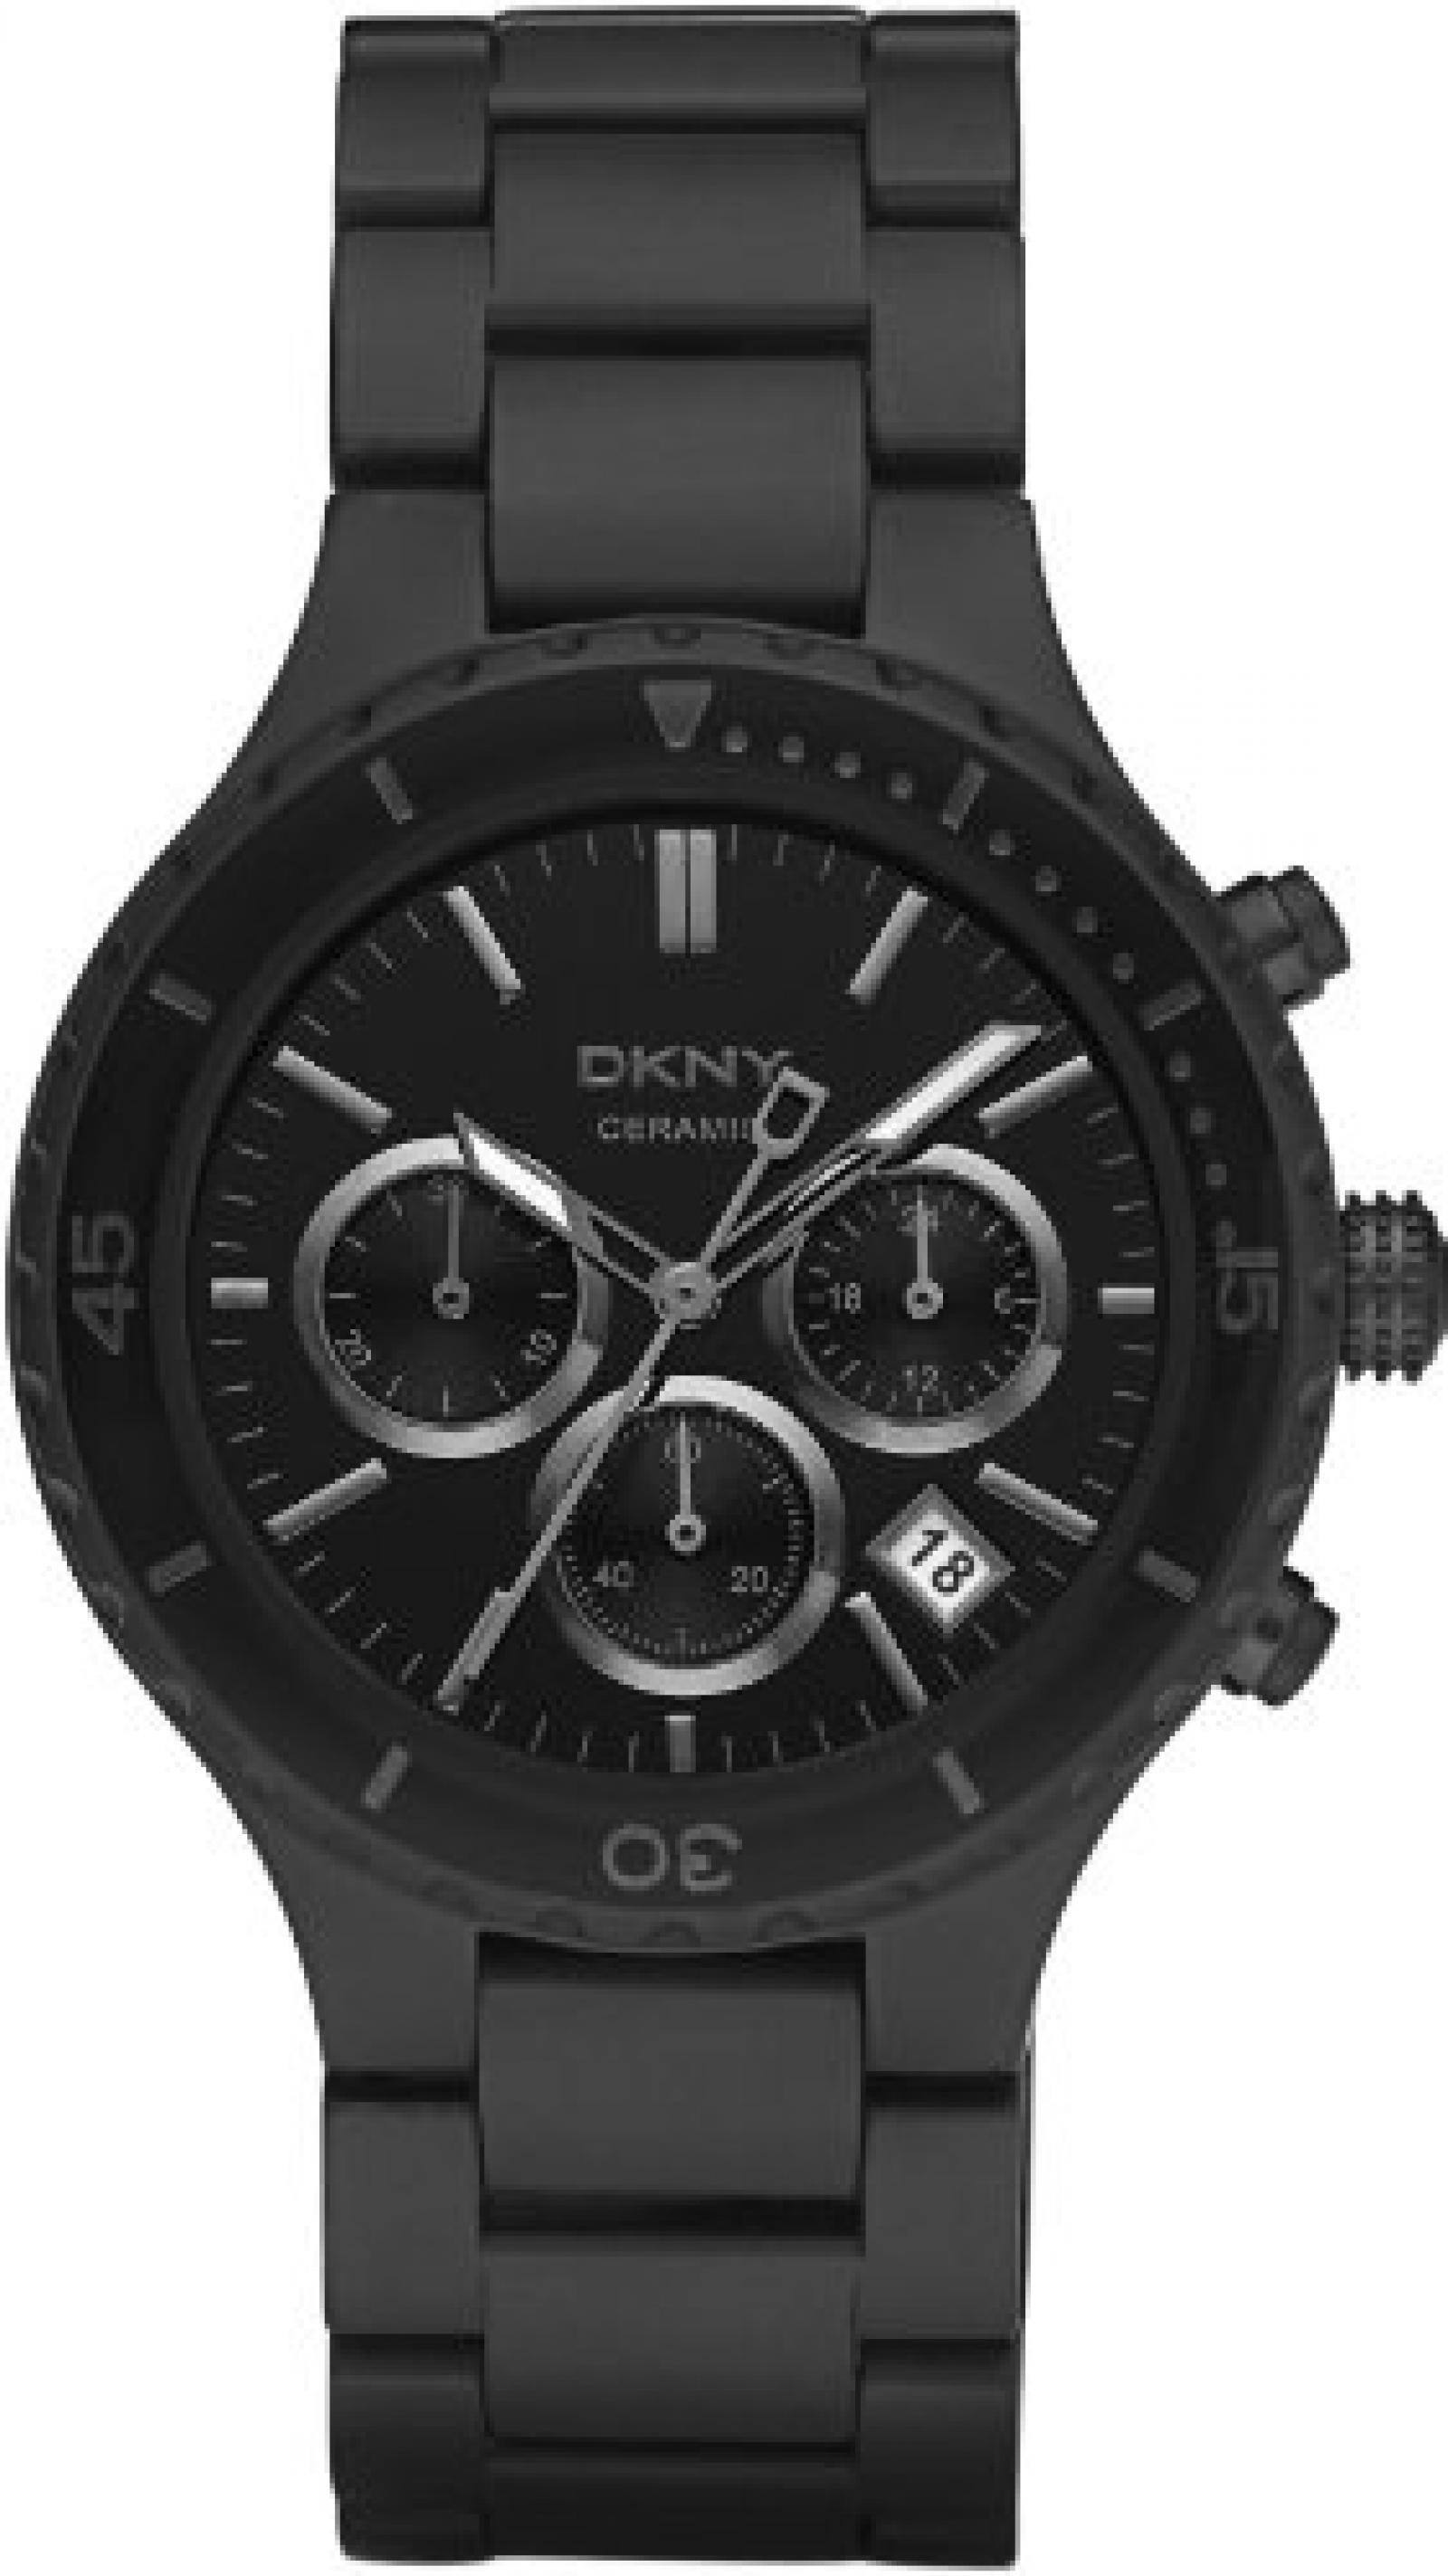 DKNY Uhren - NY8188, Herren-Uhr